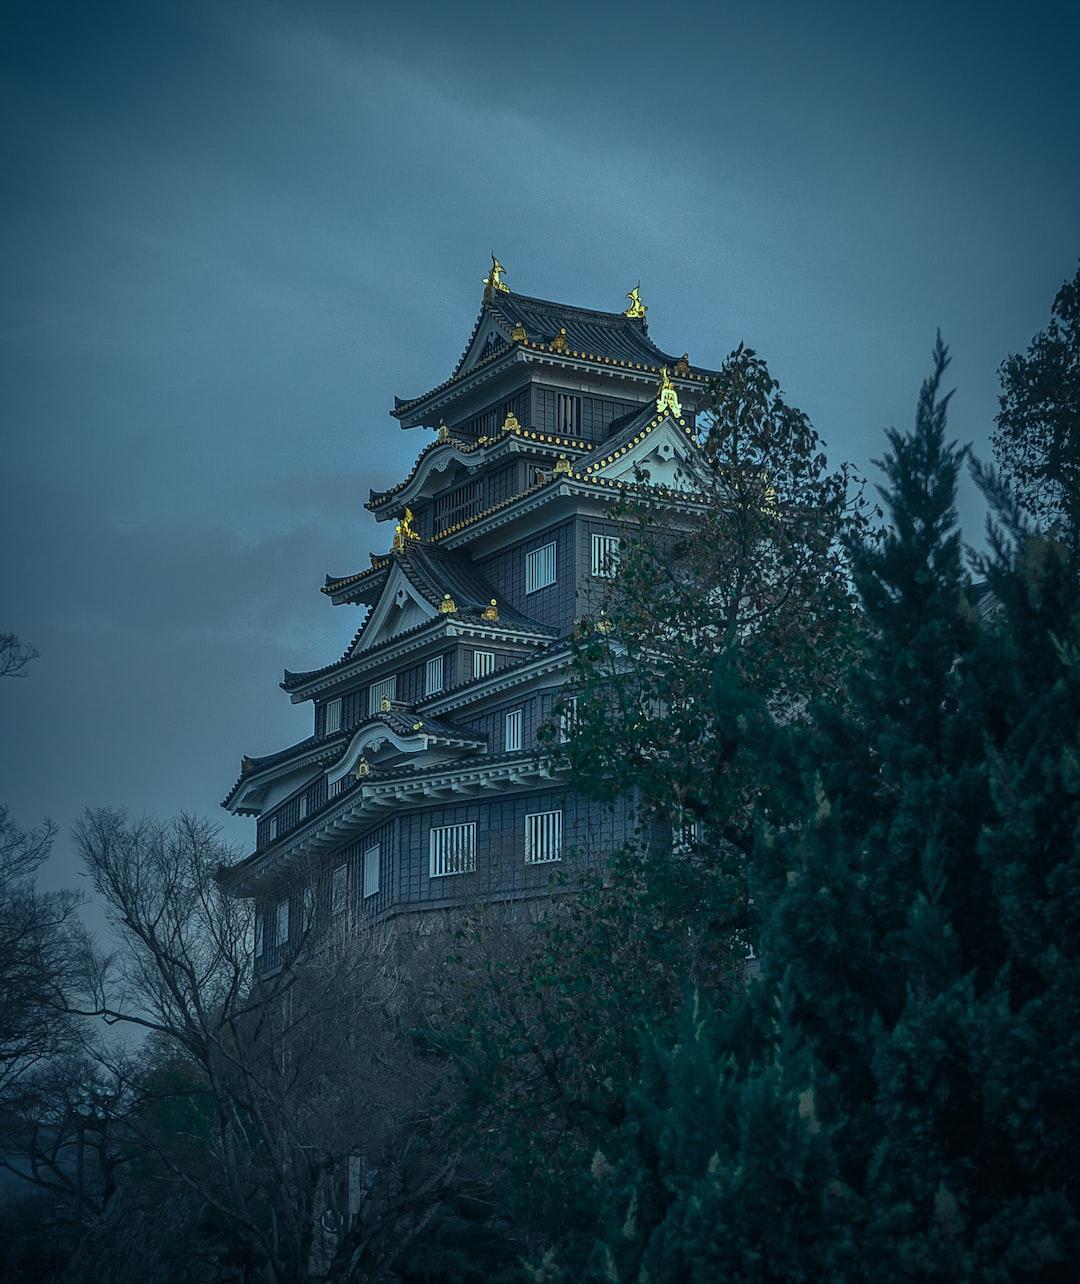 A Complete Guide To Okayama Castle and Korakuen Garden